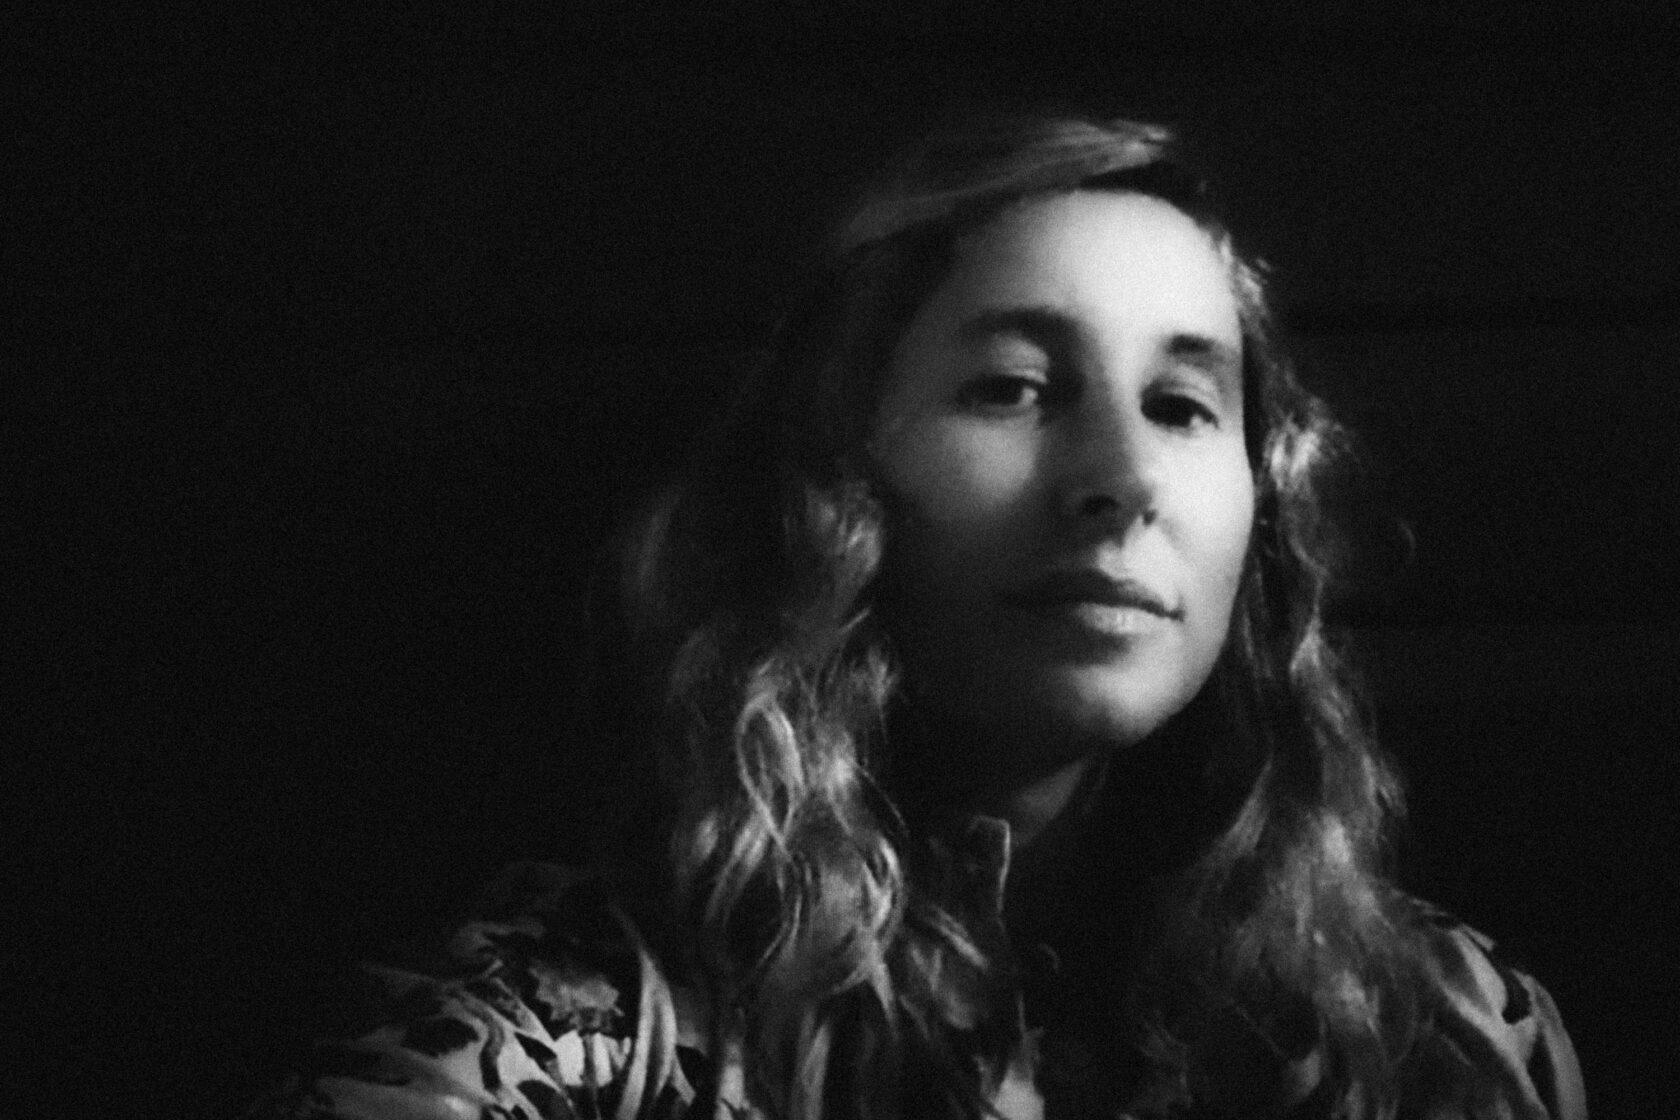 128: Lauren Hill - Looking Sideways